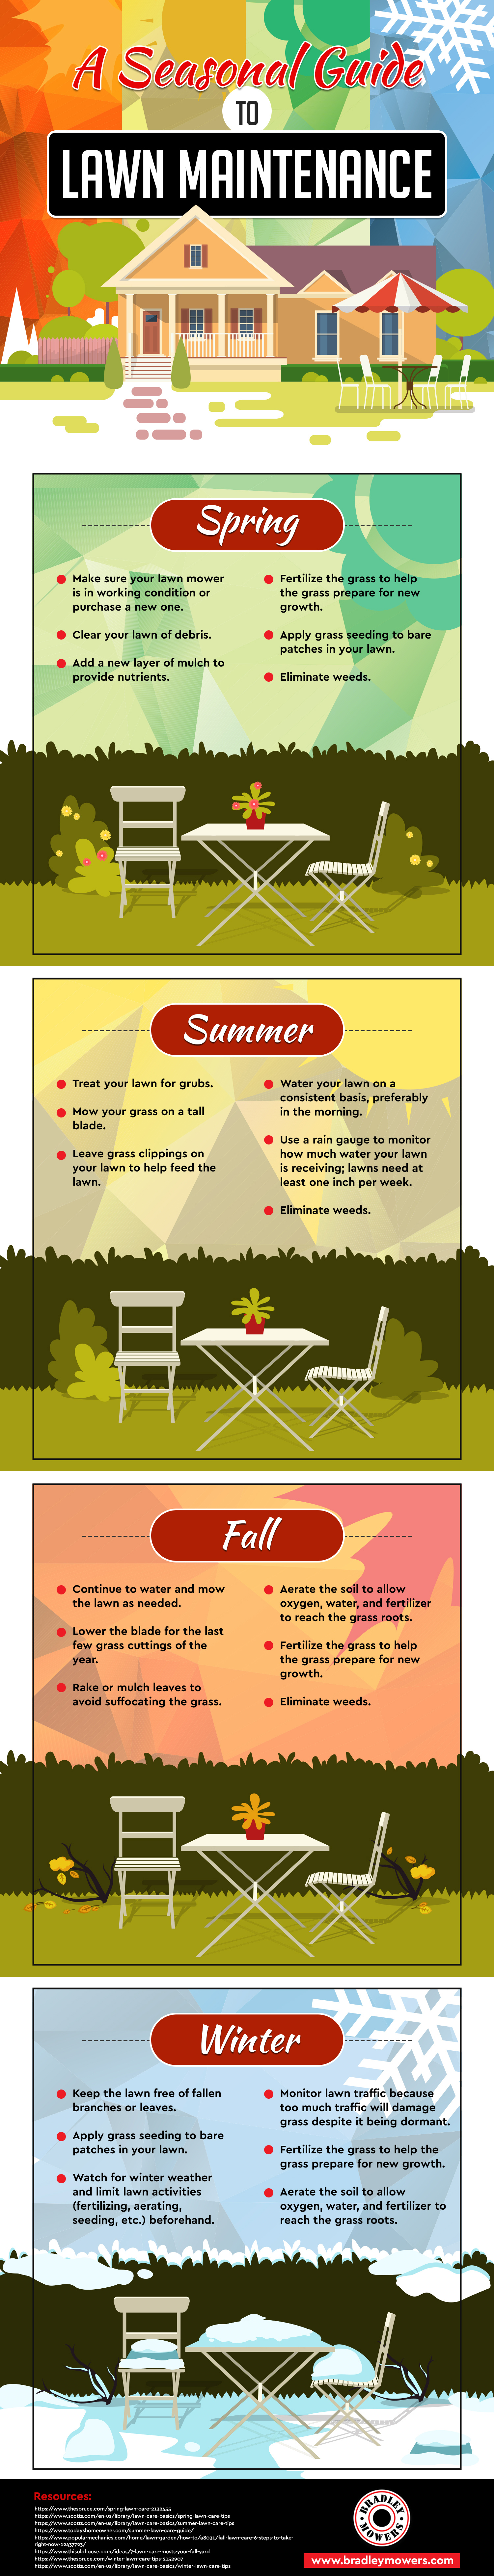 A Seasonal Guide to Lawn Maintenance